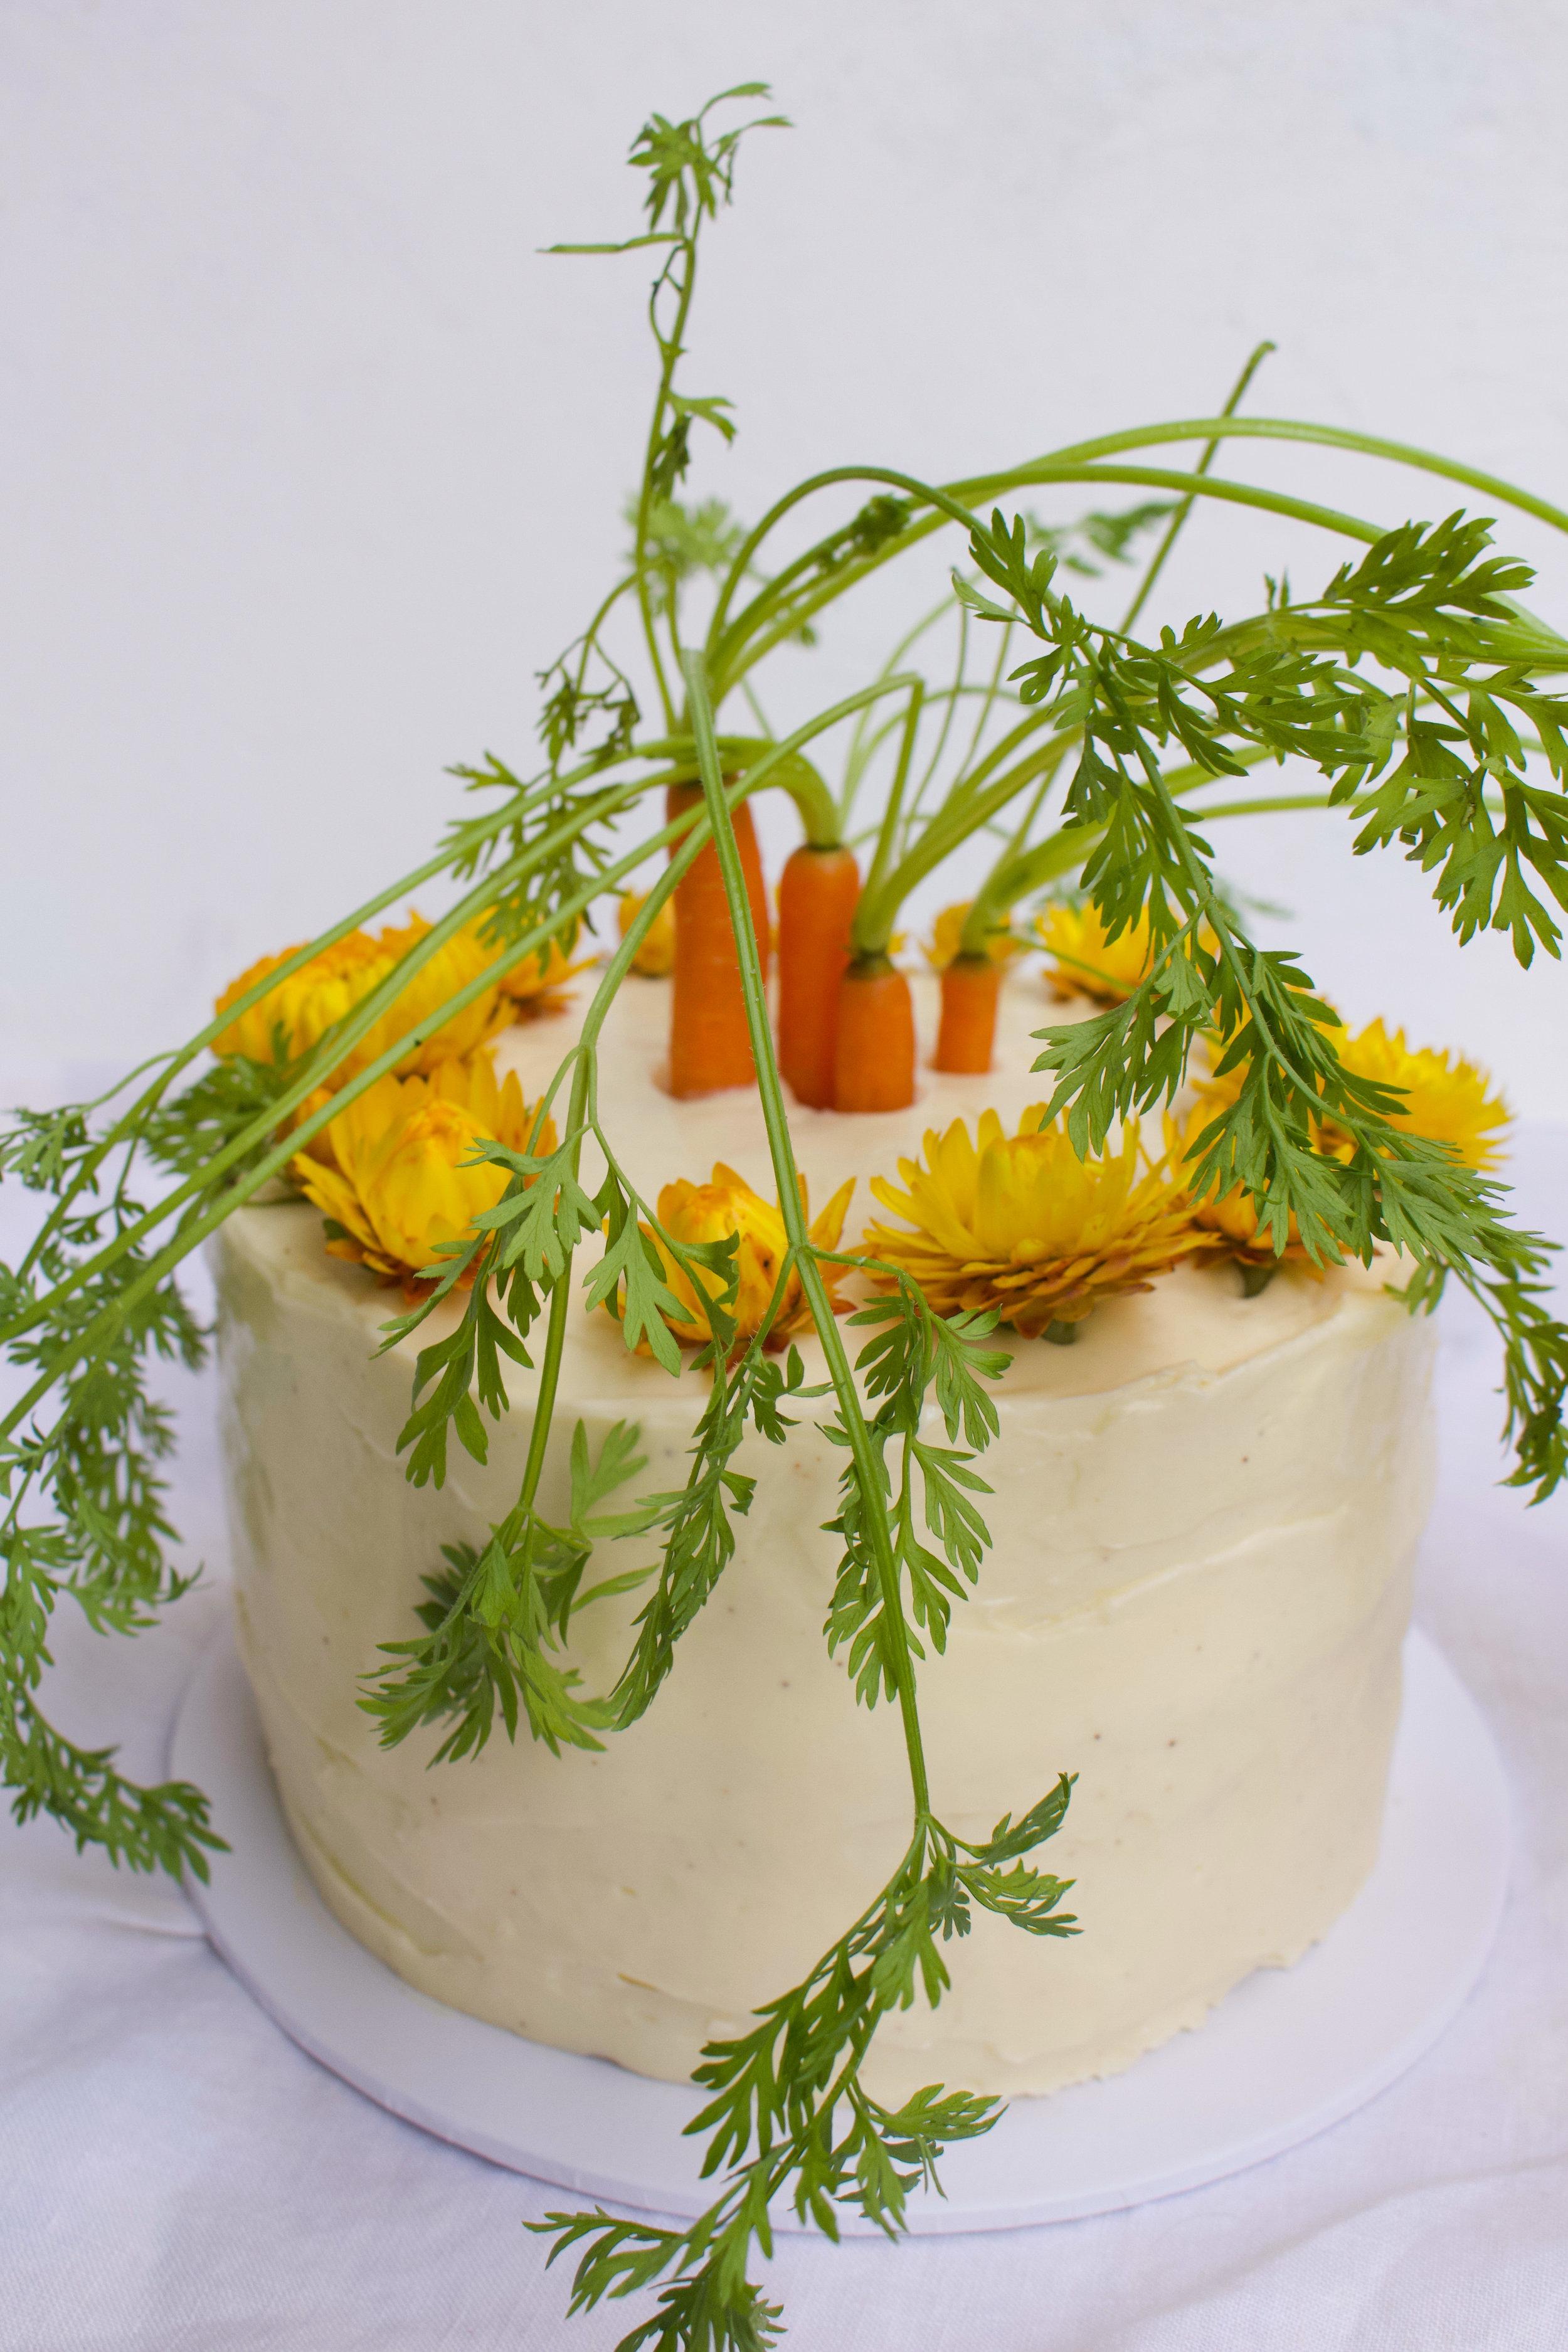 < carrot & cream cheese >